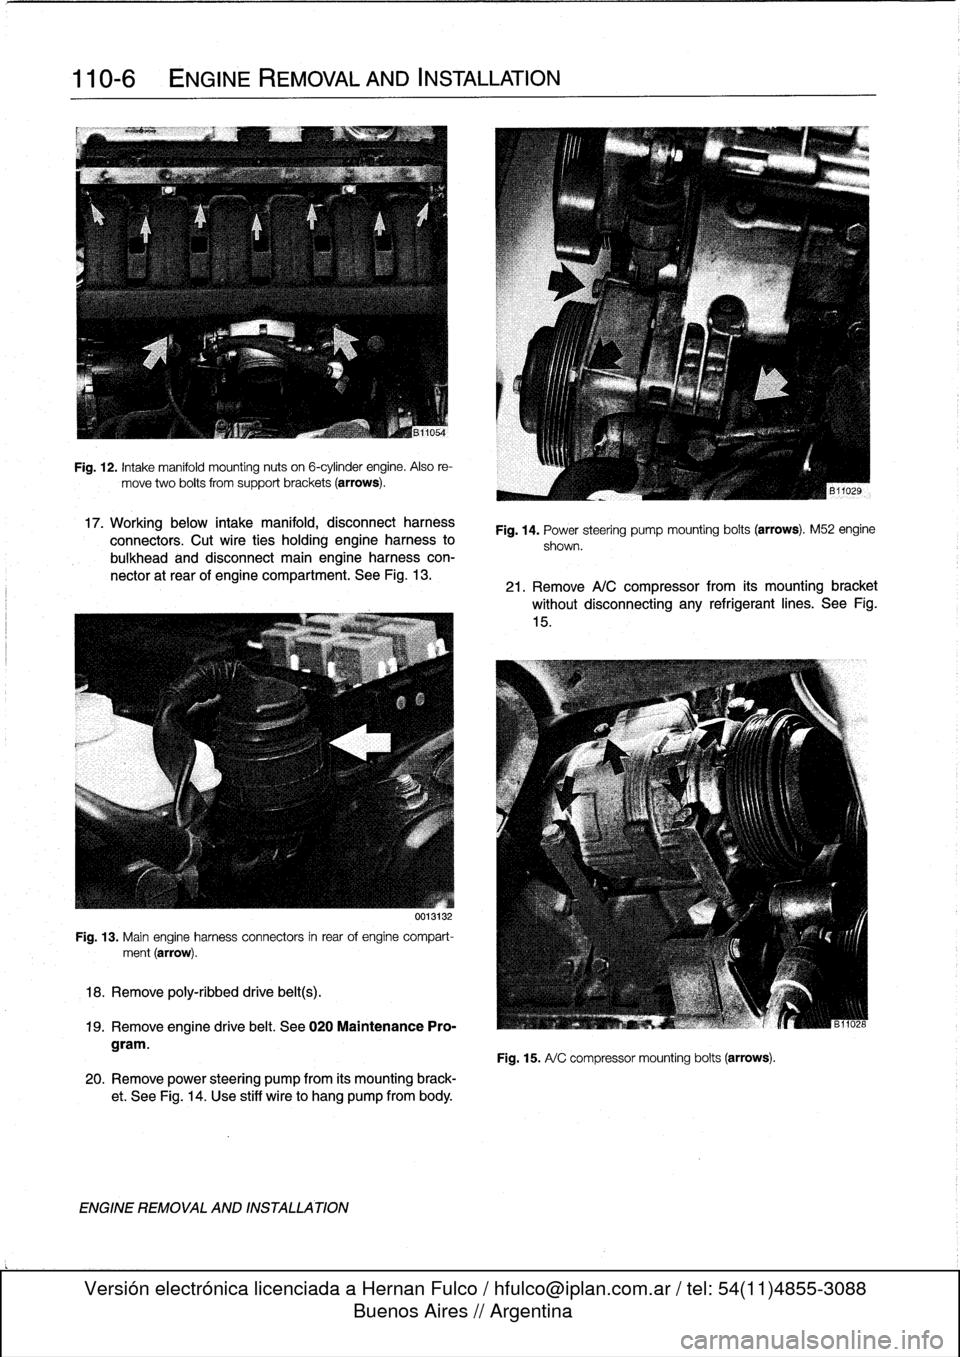 Bmw 325i 1994 E36 Workshop Manual 325ci Wiring Harness